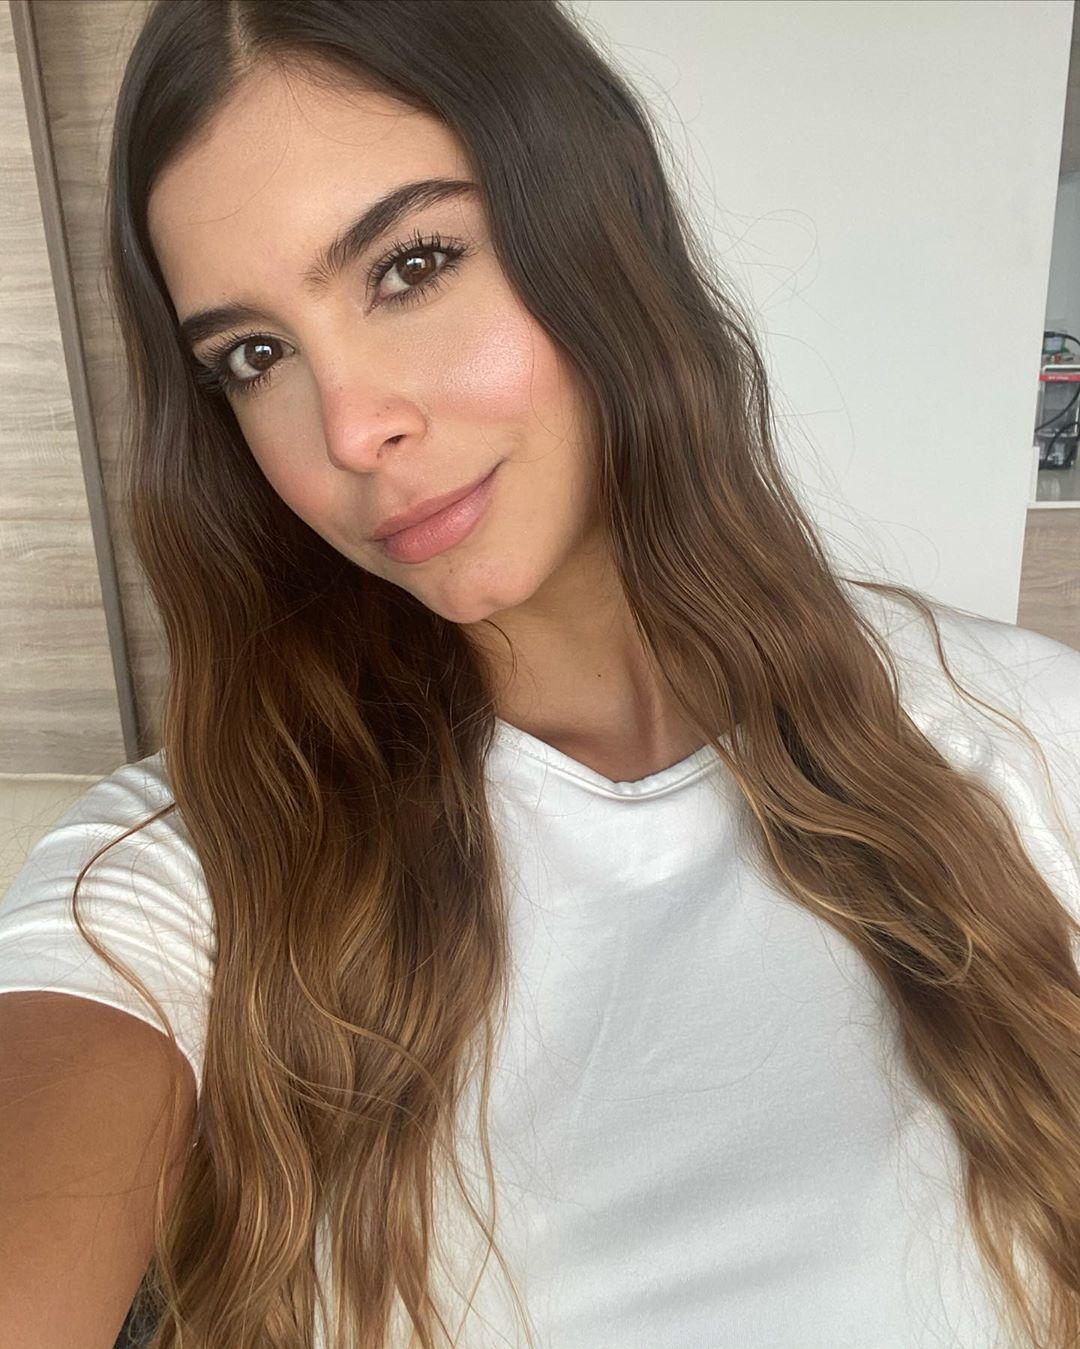 Daniela-Medina-Wallpapers-Insta-FIt-Bio-9